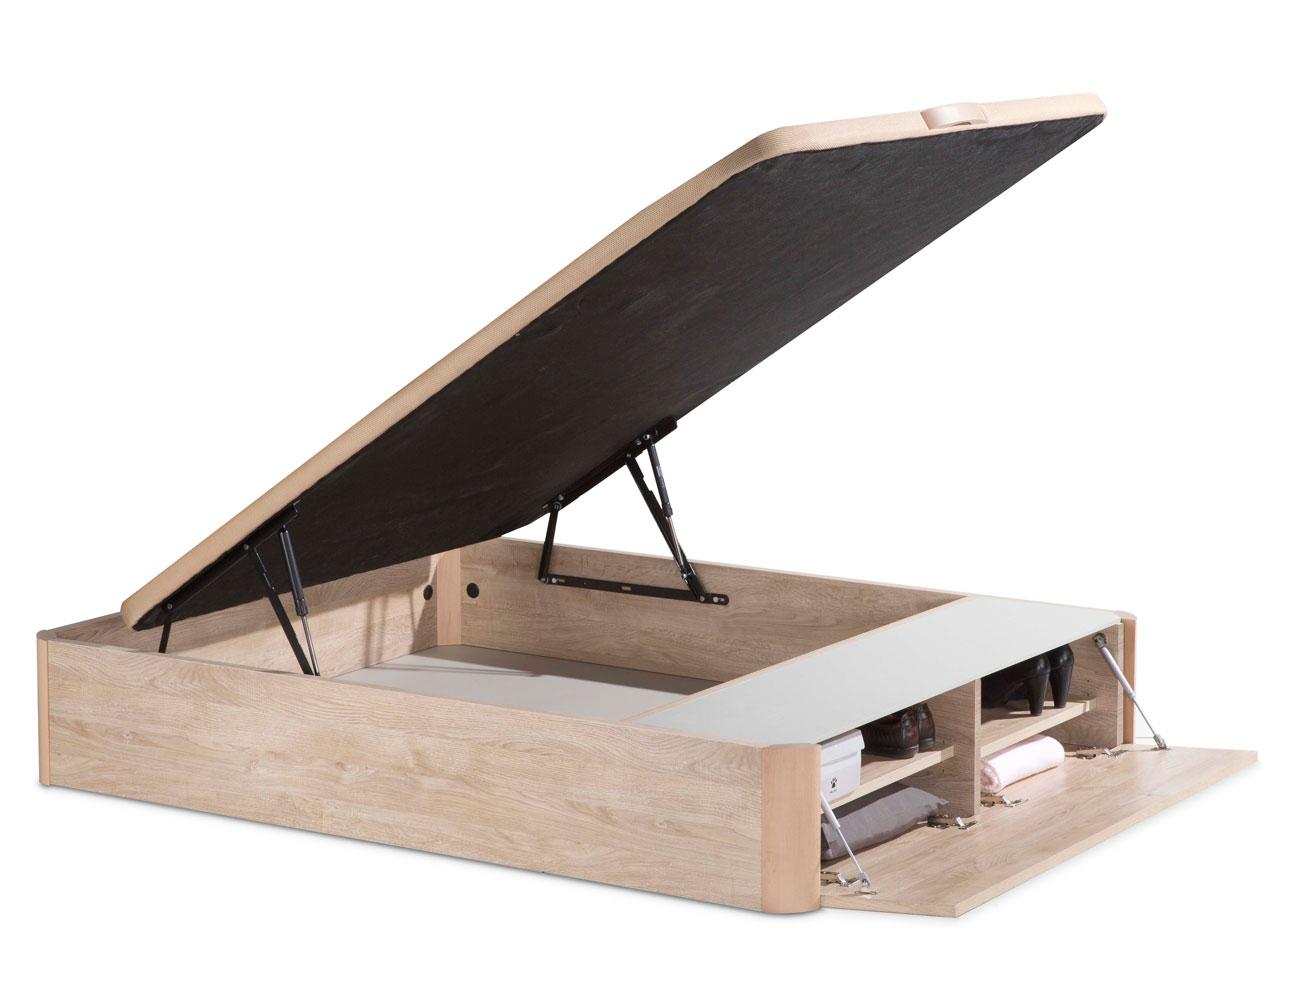 Canape zapatero madera tapa 3d 7616